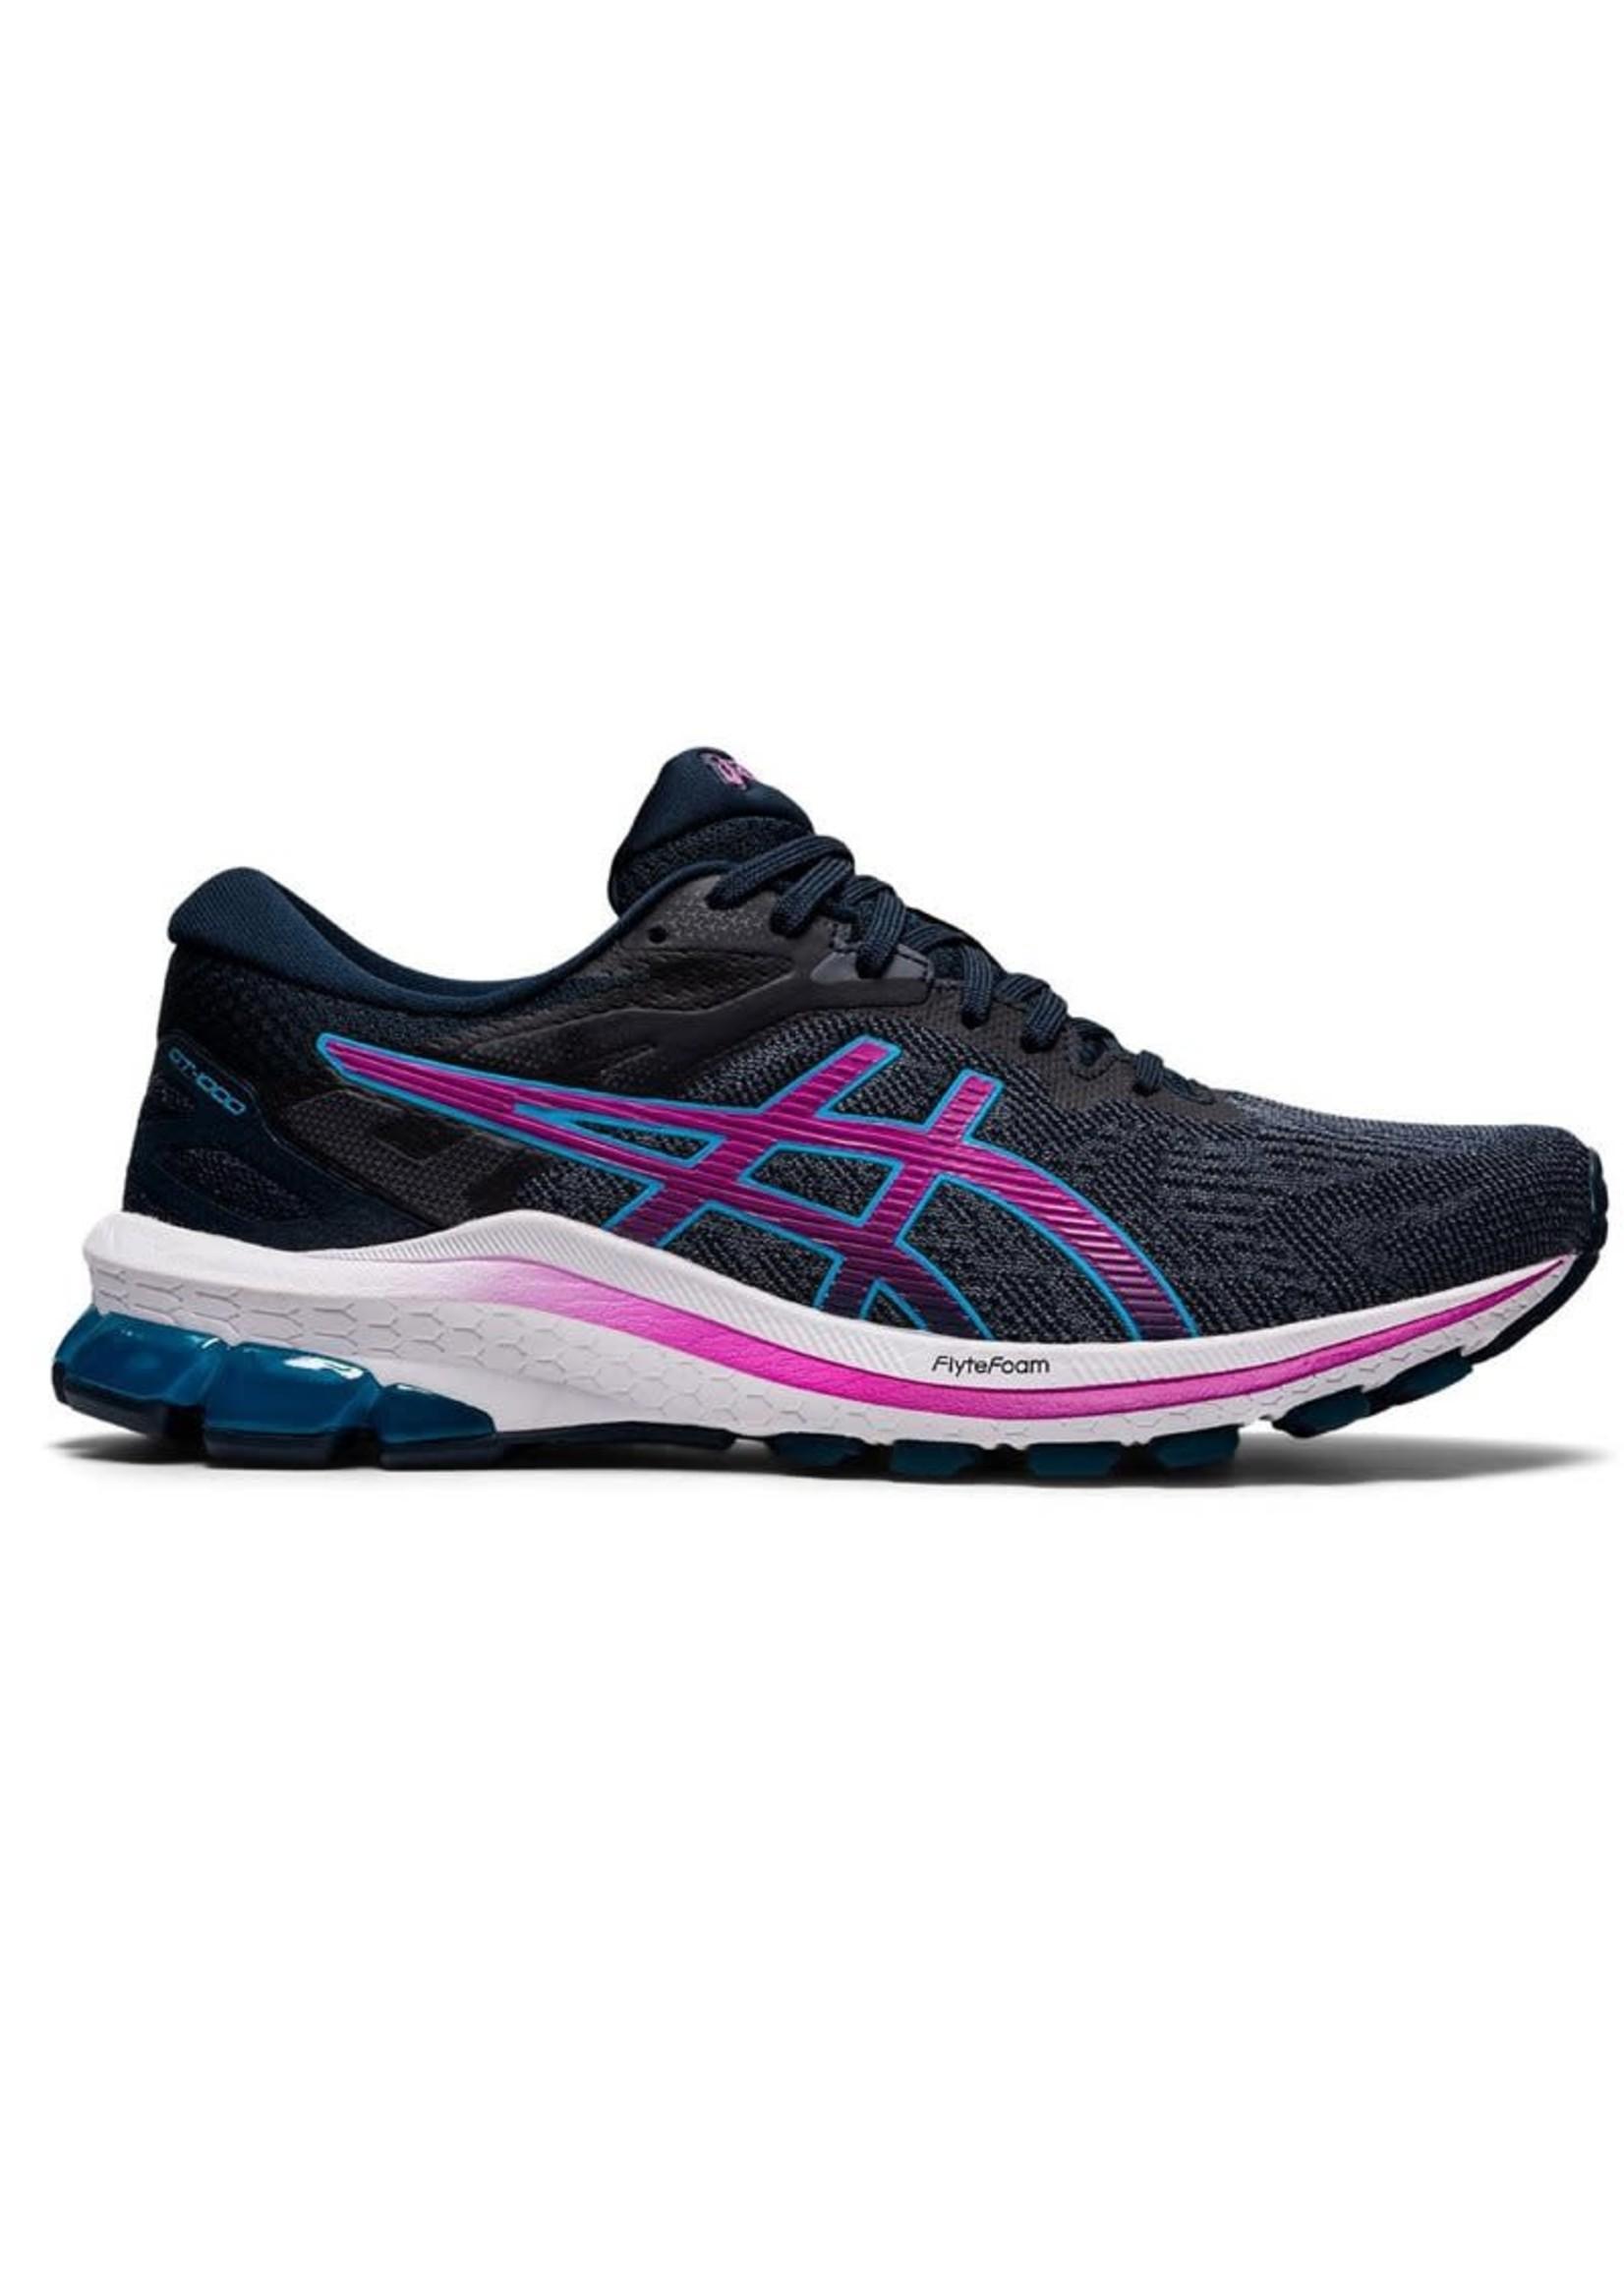 Asics Asics GT-1000 10 Womens Runing Shoe (2021)